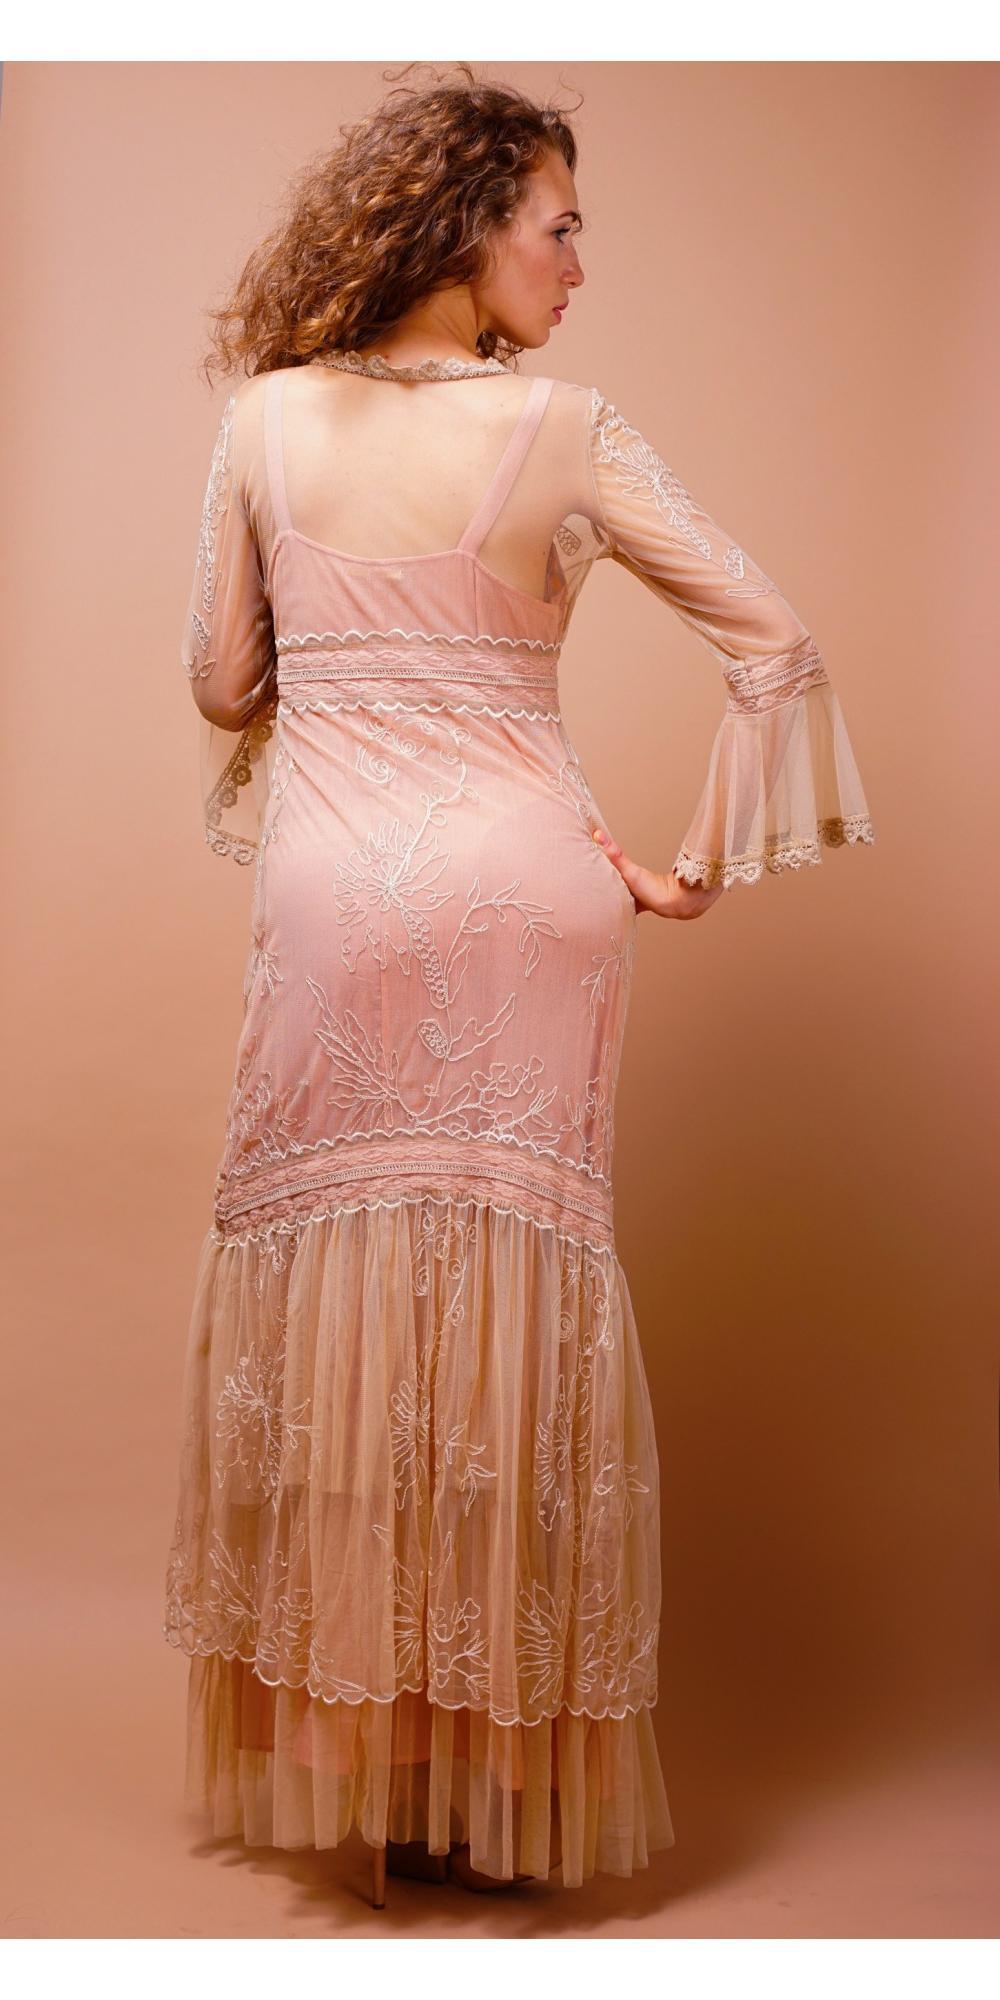 titanic wedding dress in pinkchampagne by nataya